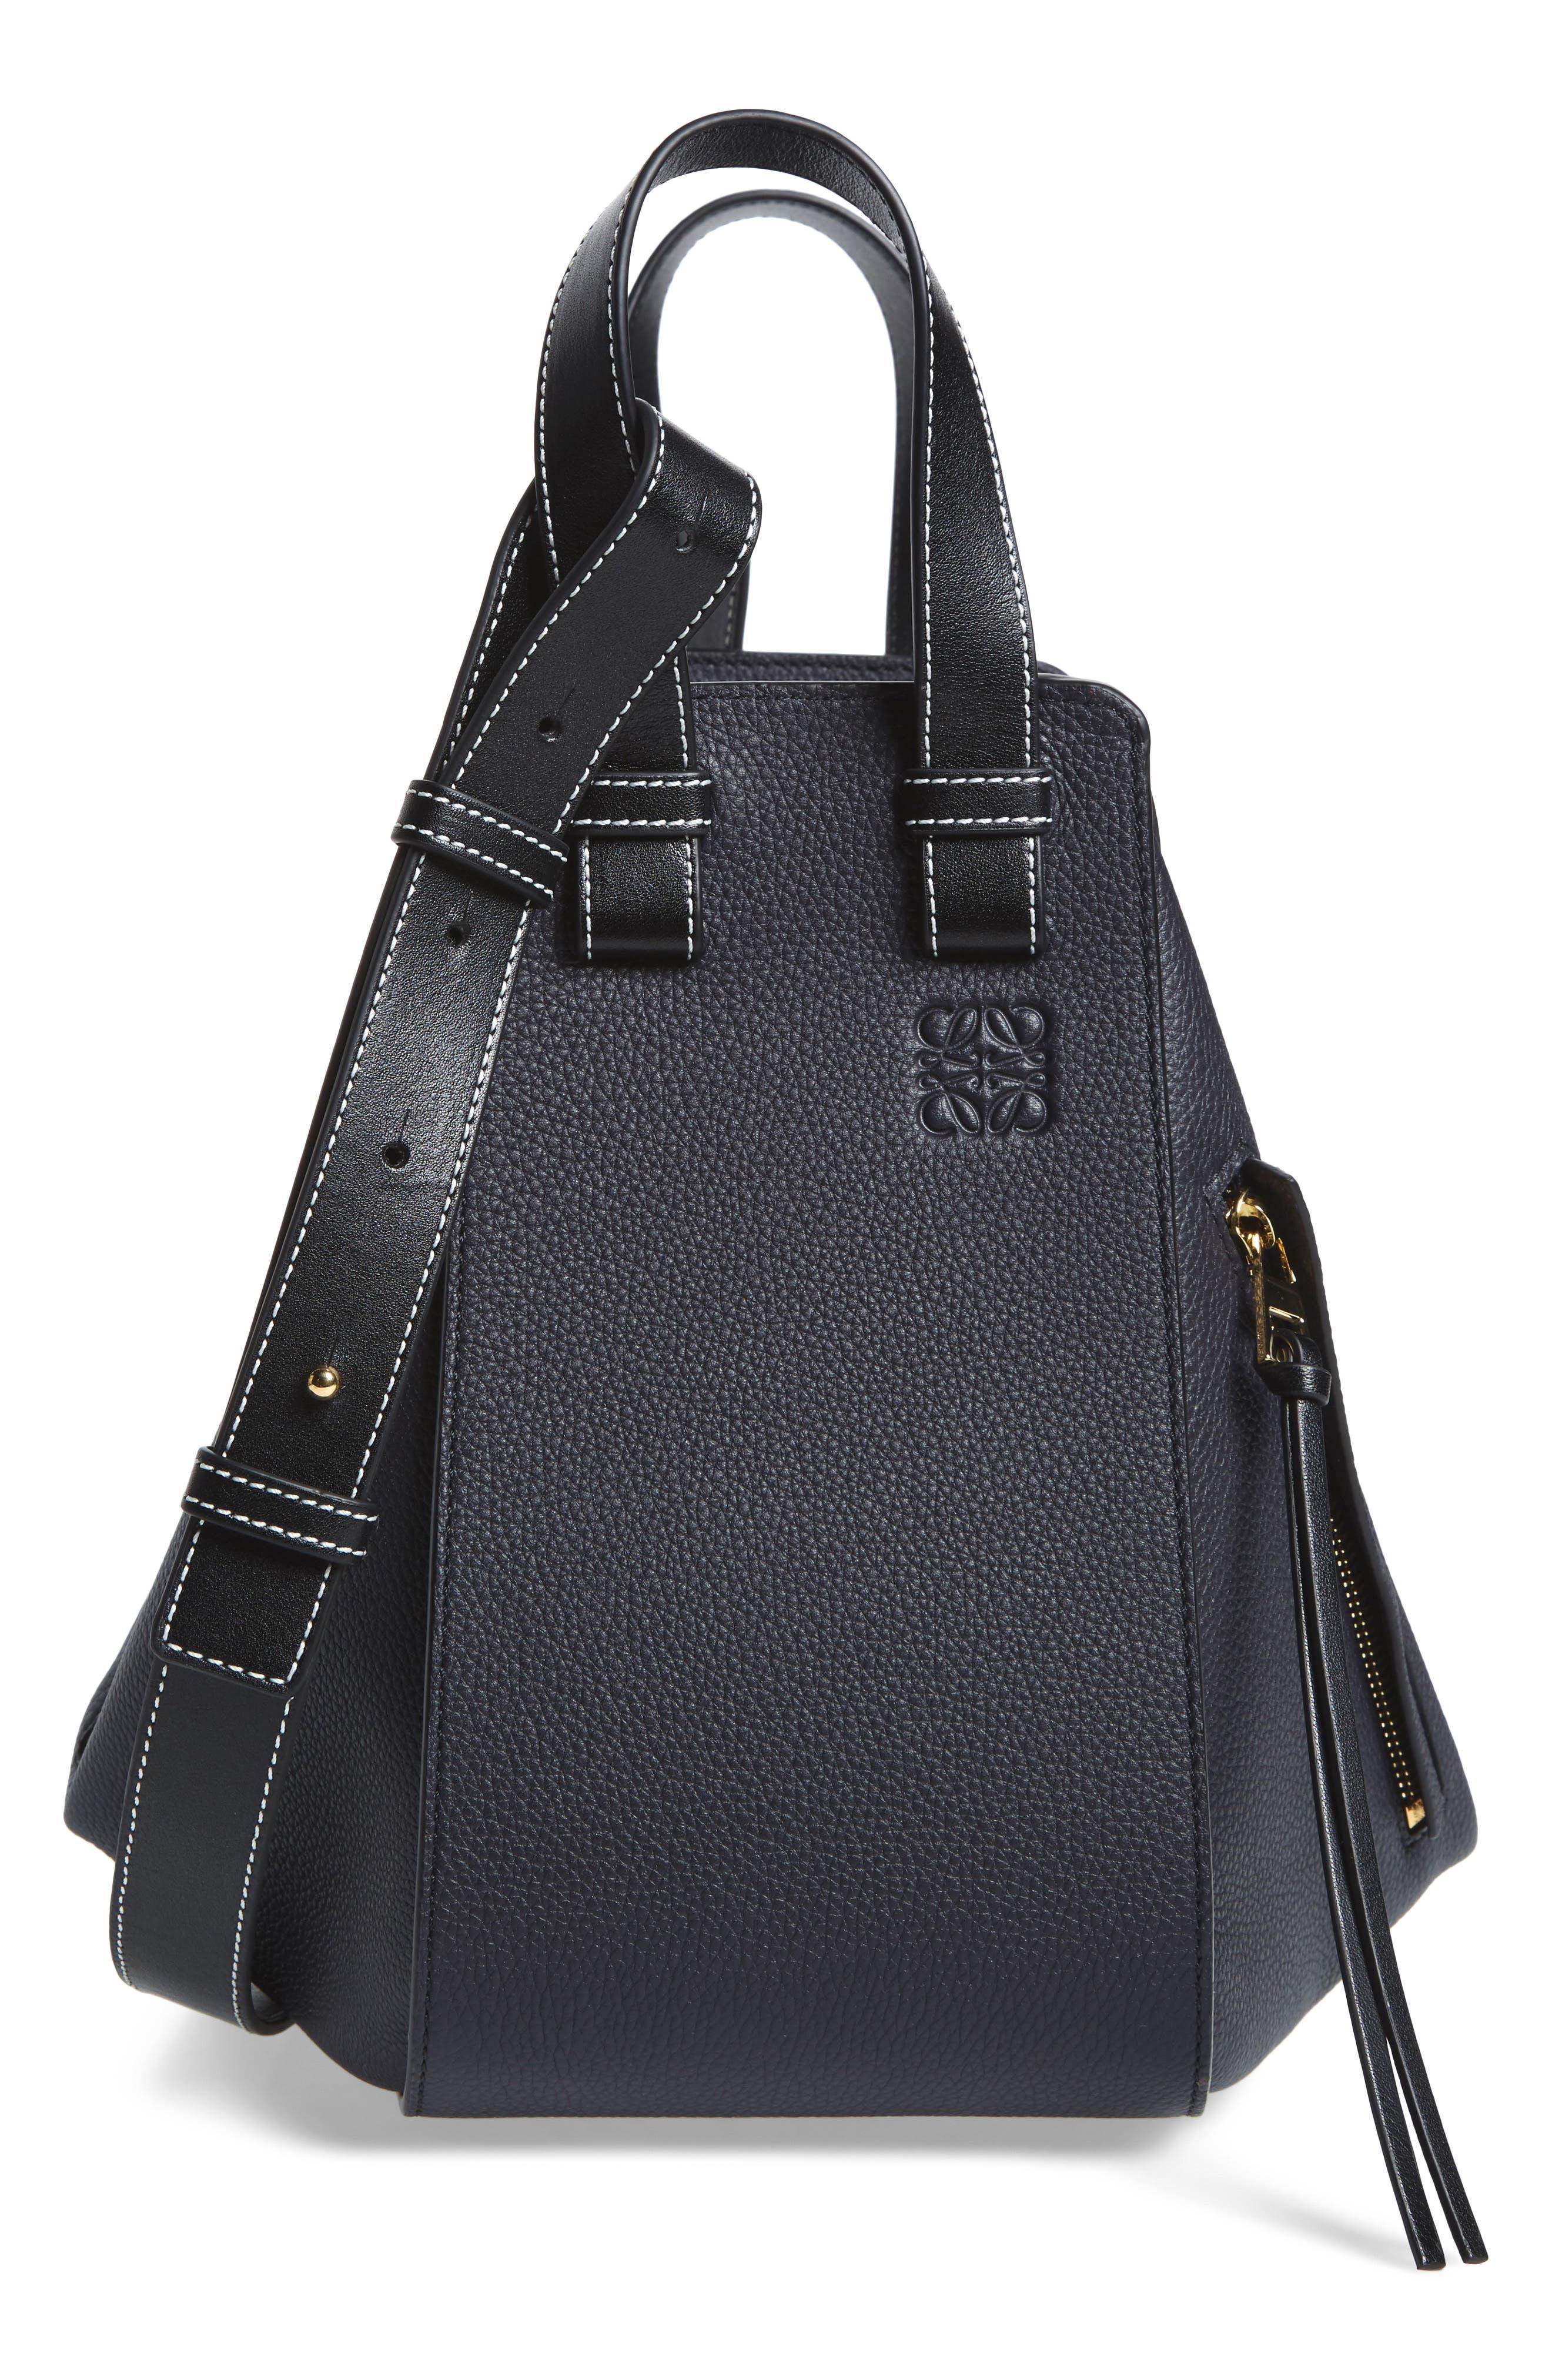 Main Image - Loewe Small Hammock Pebbled Leather Hobo